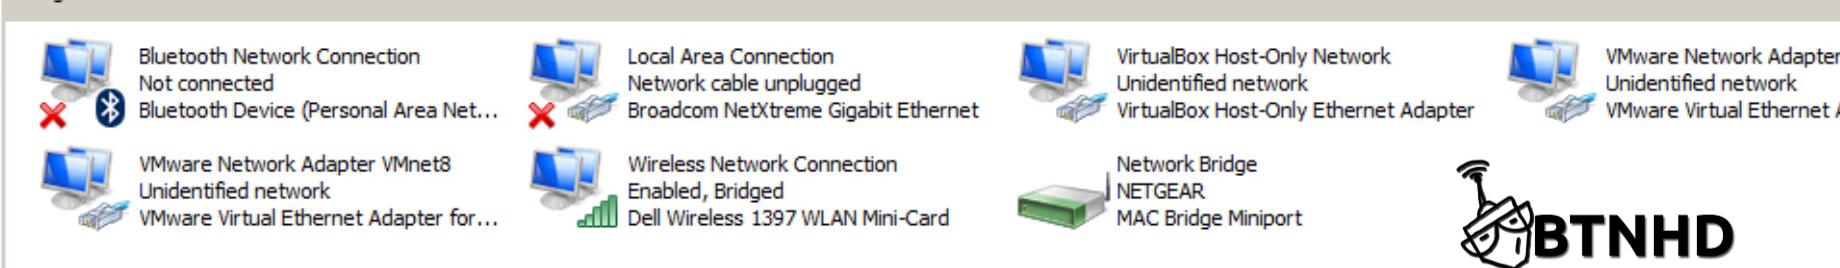 vmnet8_vmnet1_adapters